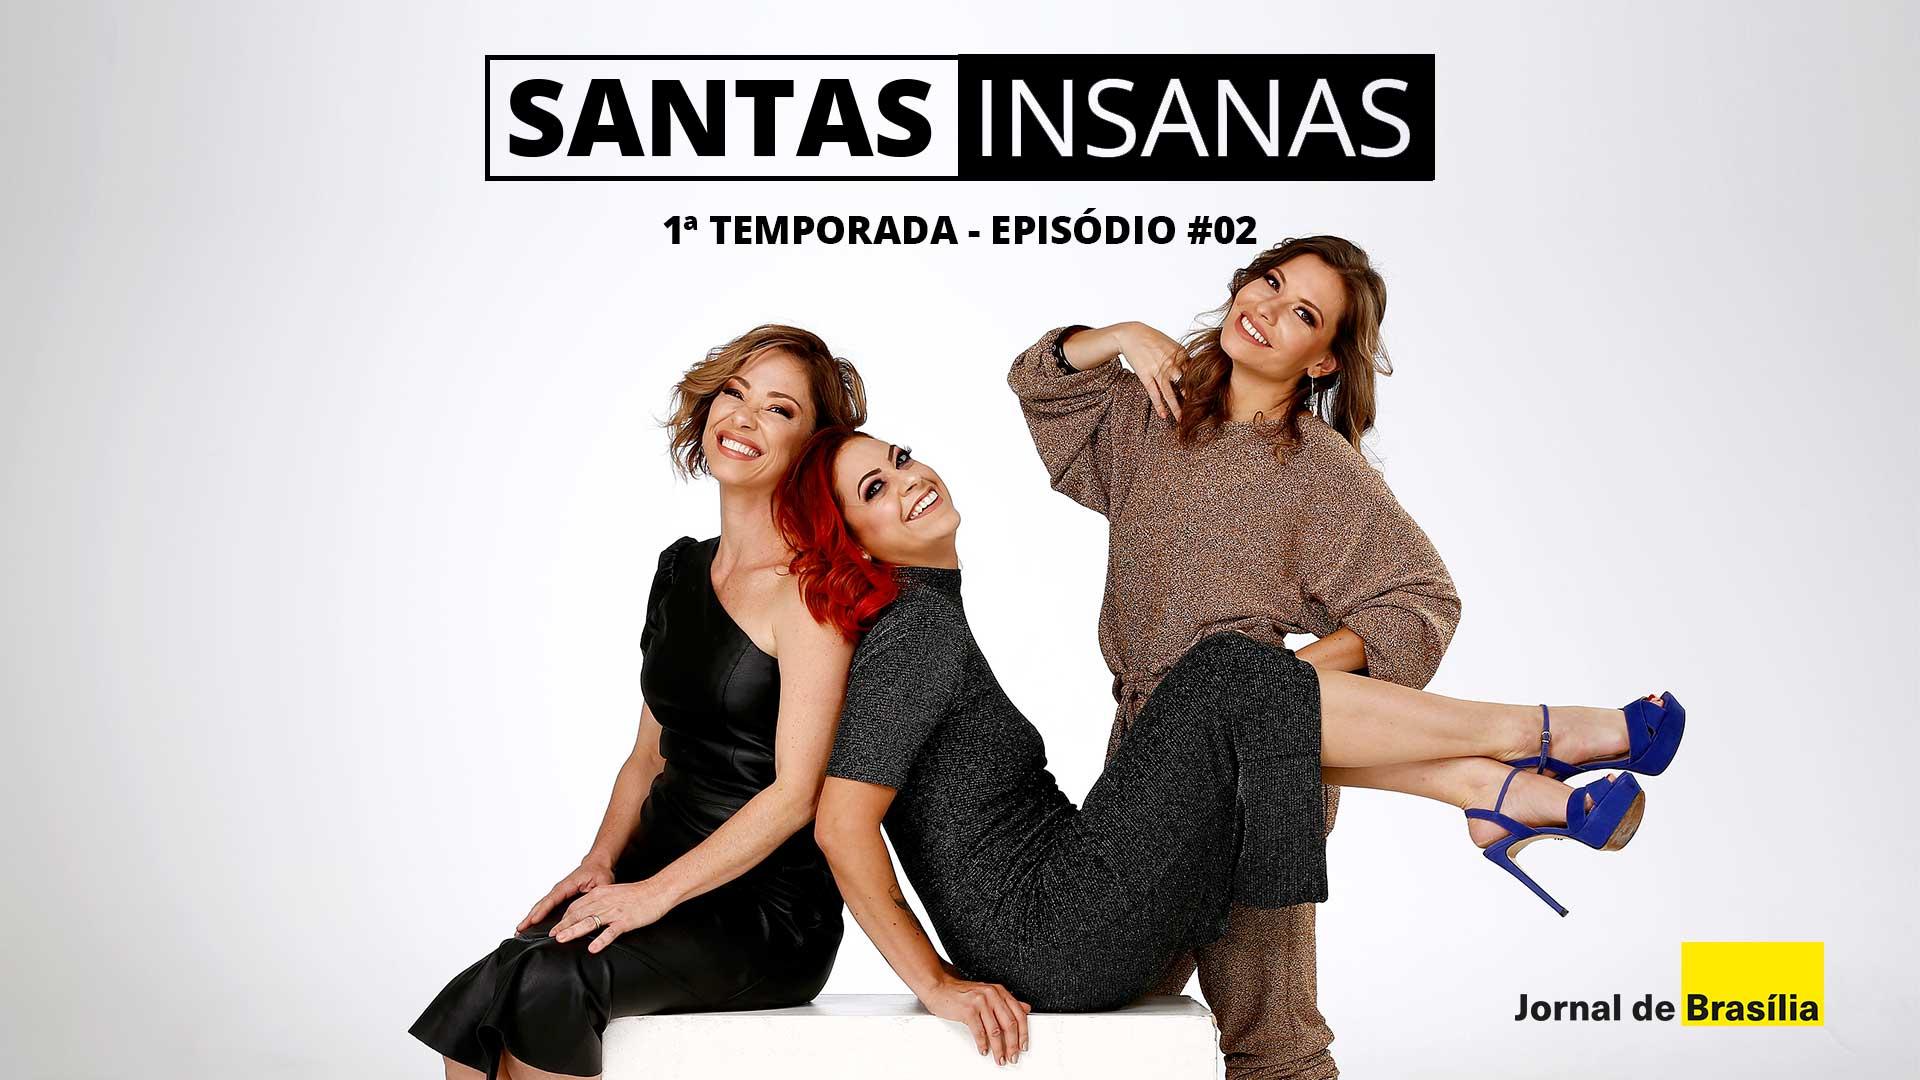 Santas Insanas - 1ª Temporada - Episódio #02